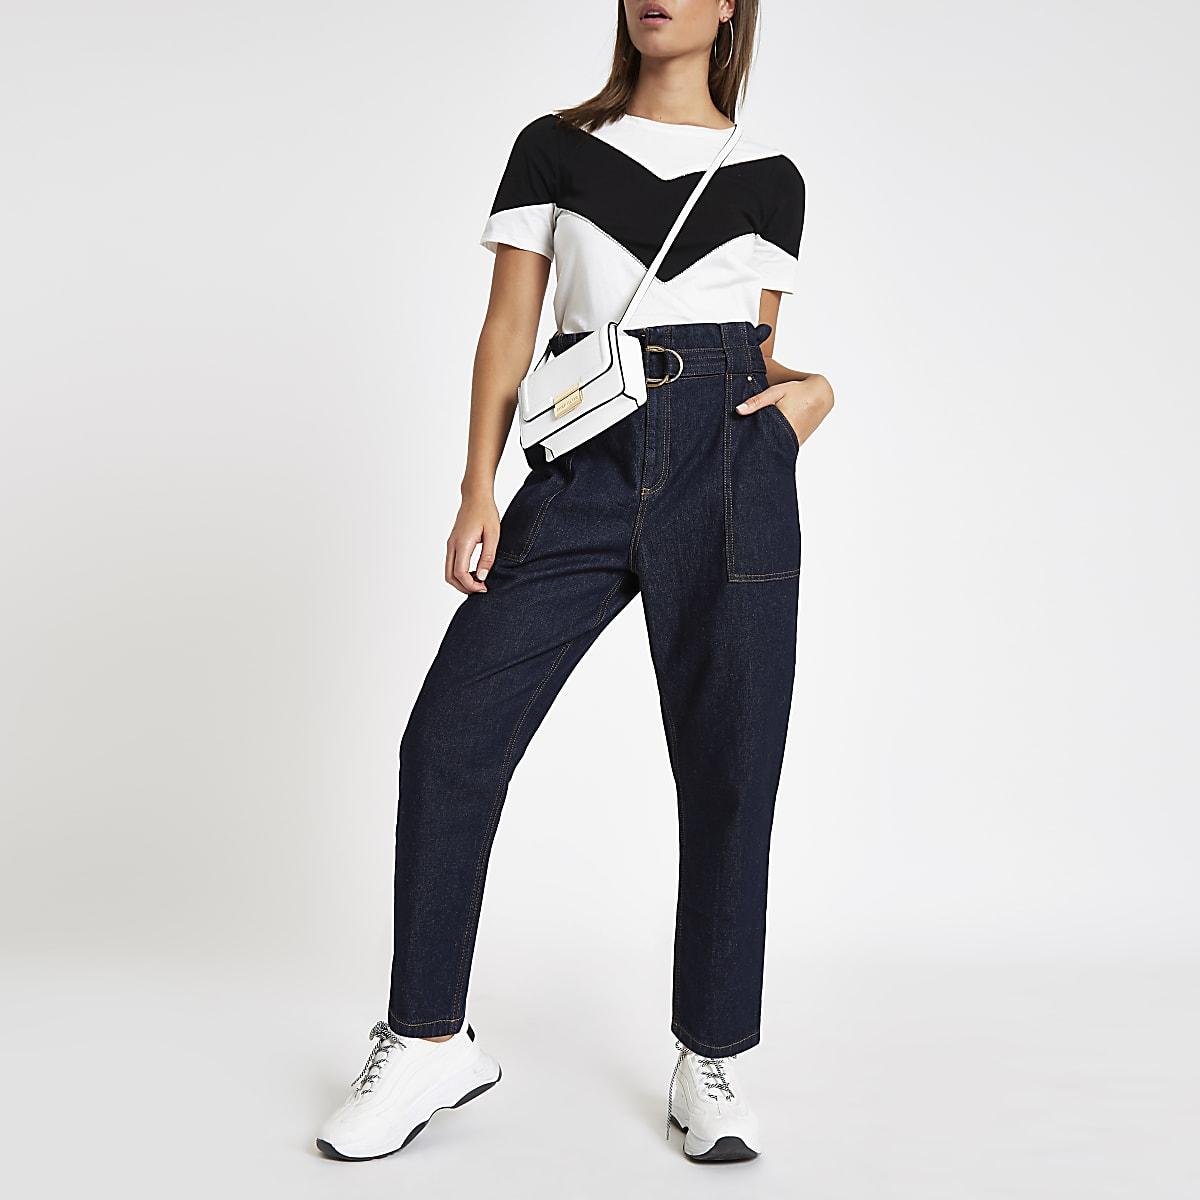 White and black colourblock T-shirt